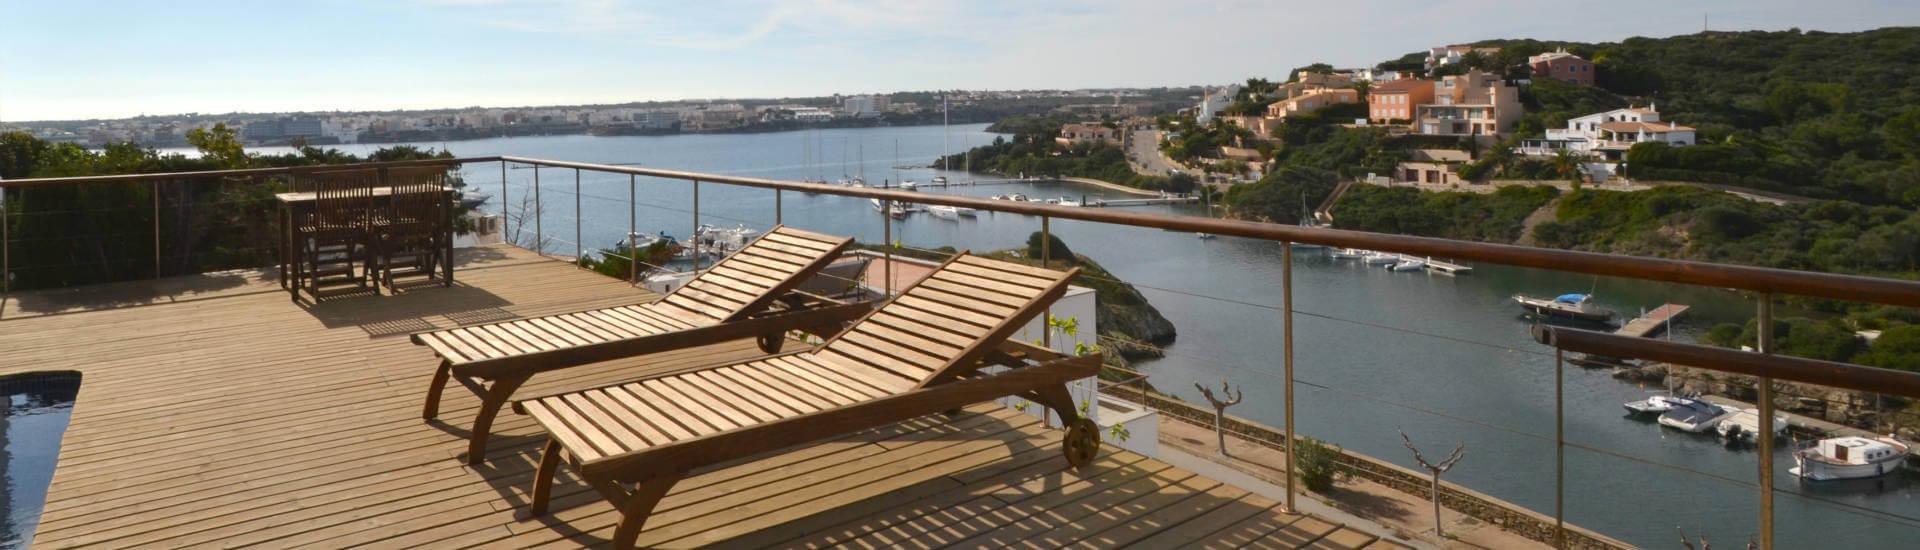 cala-llonga-villa-view-slider